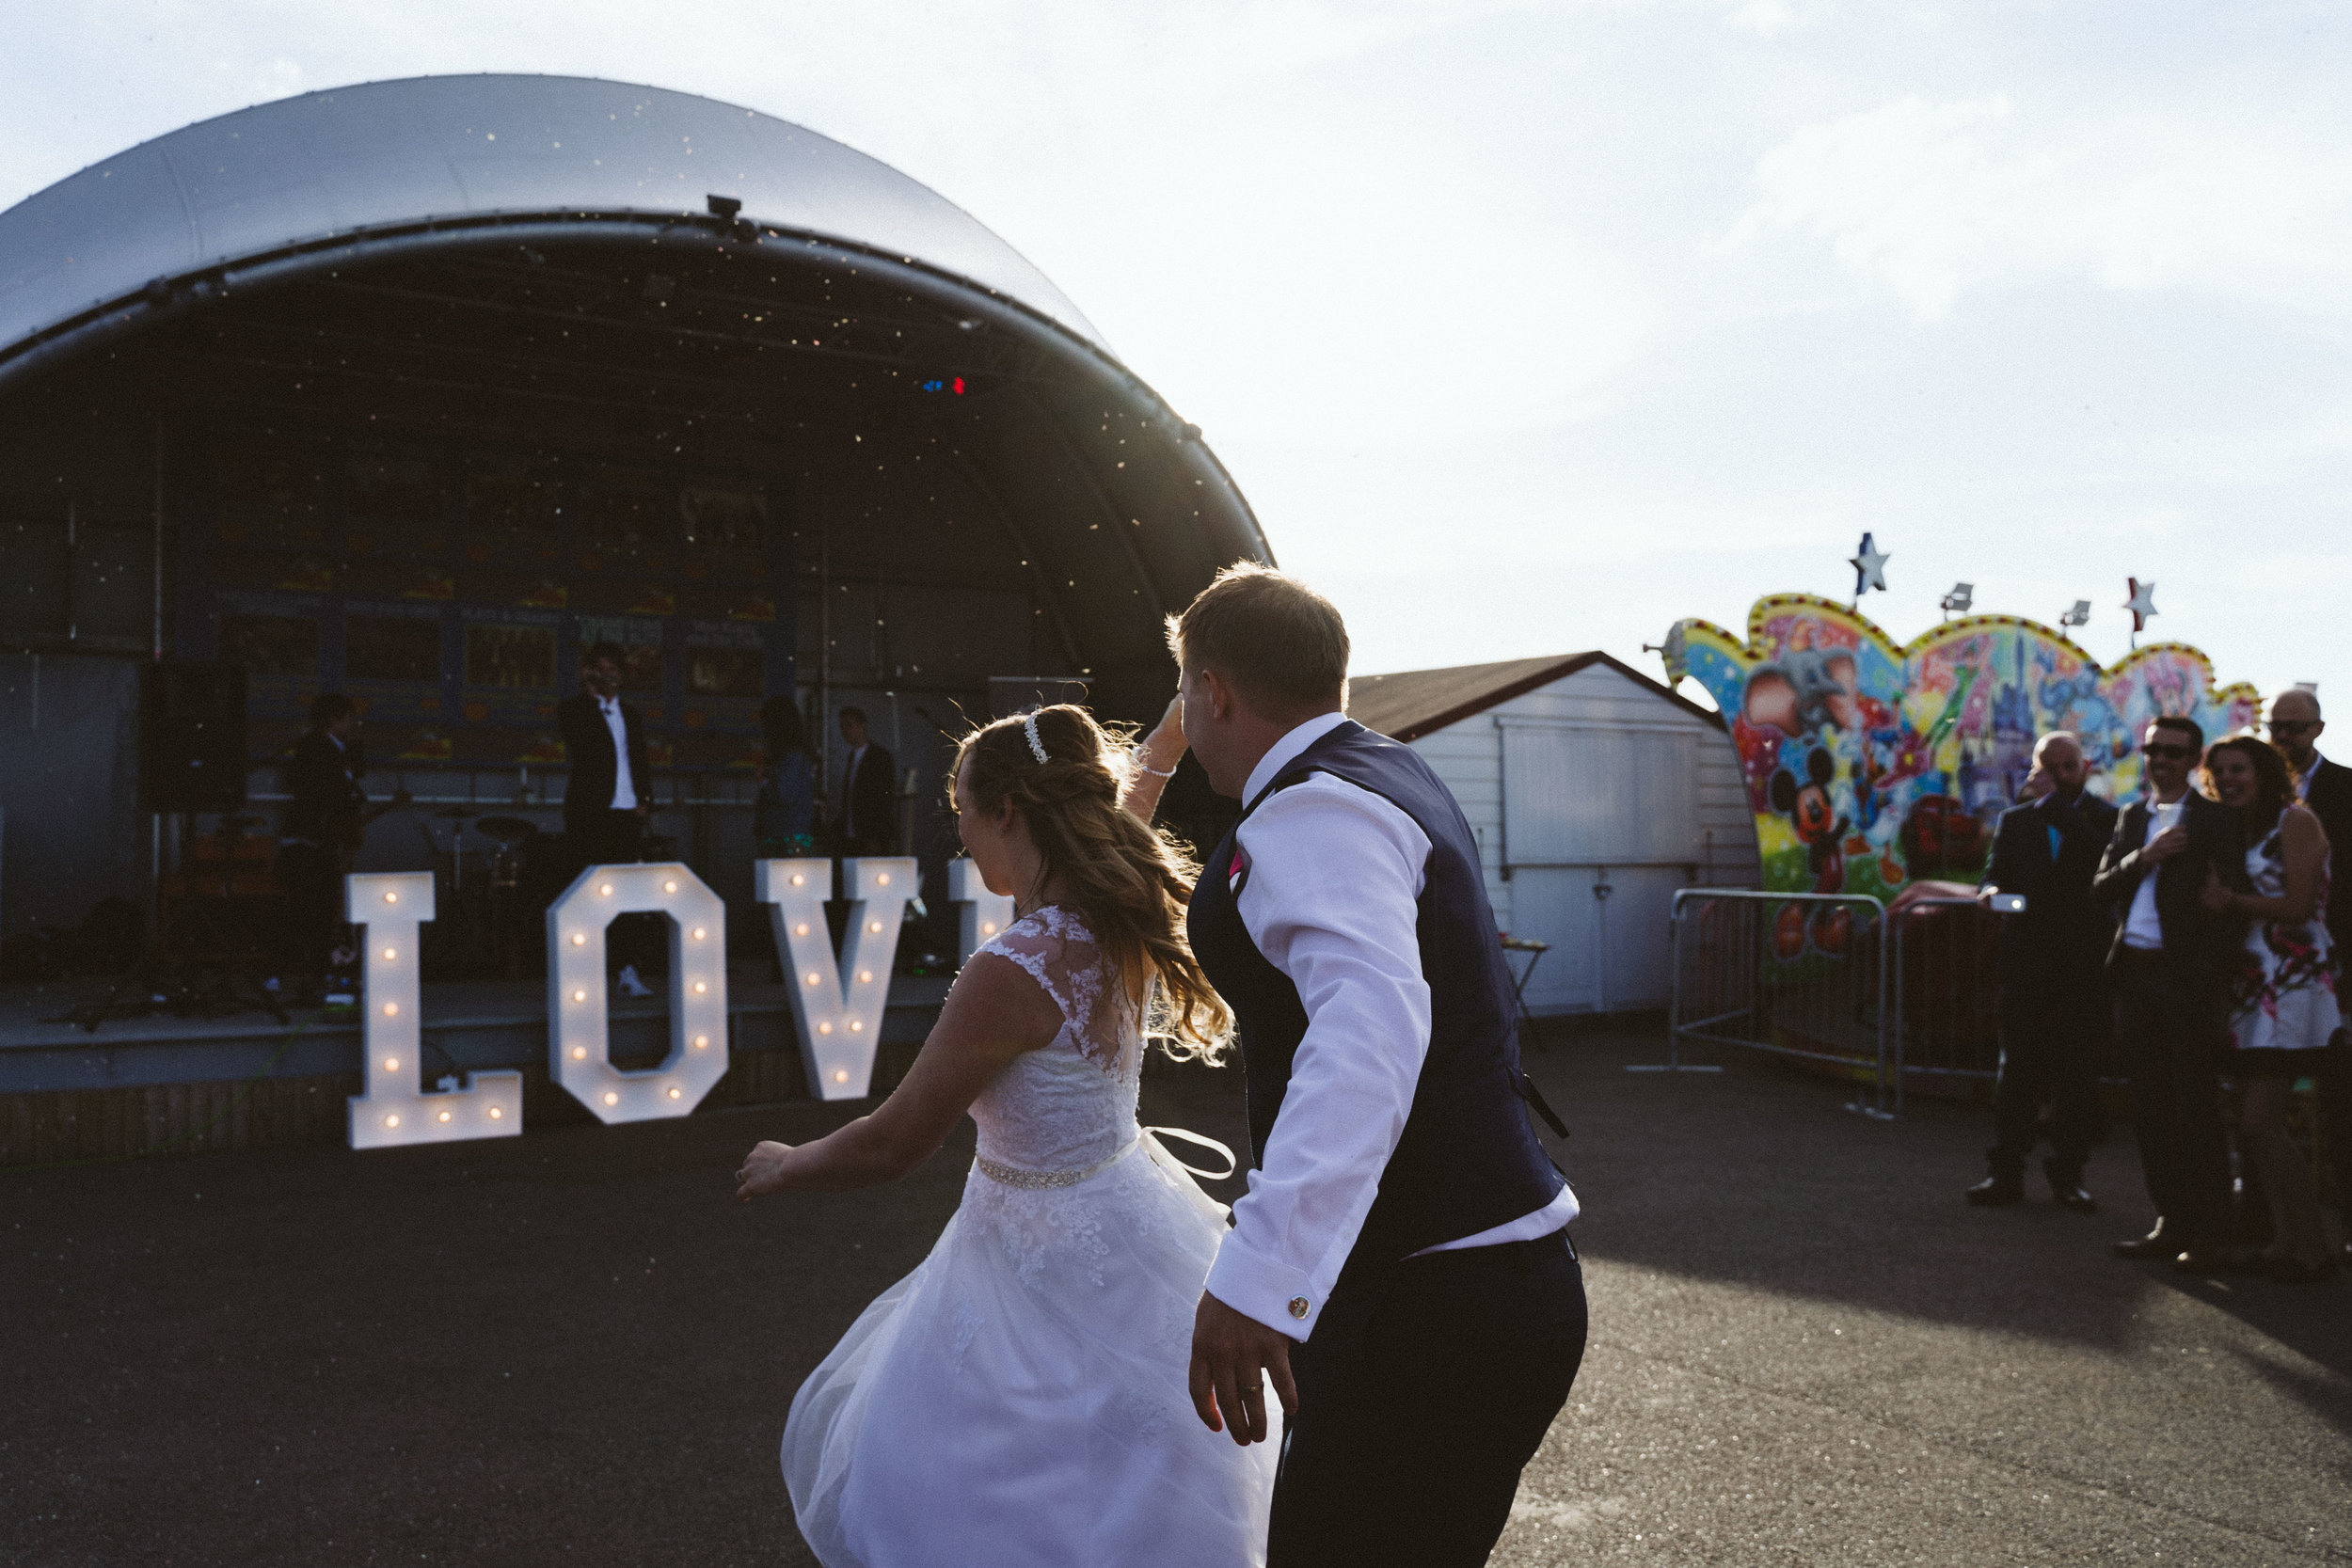 kent-wedding-photographer-100679.jpg